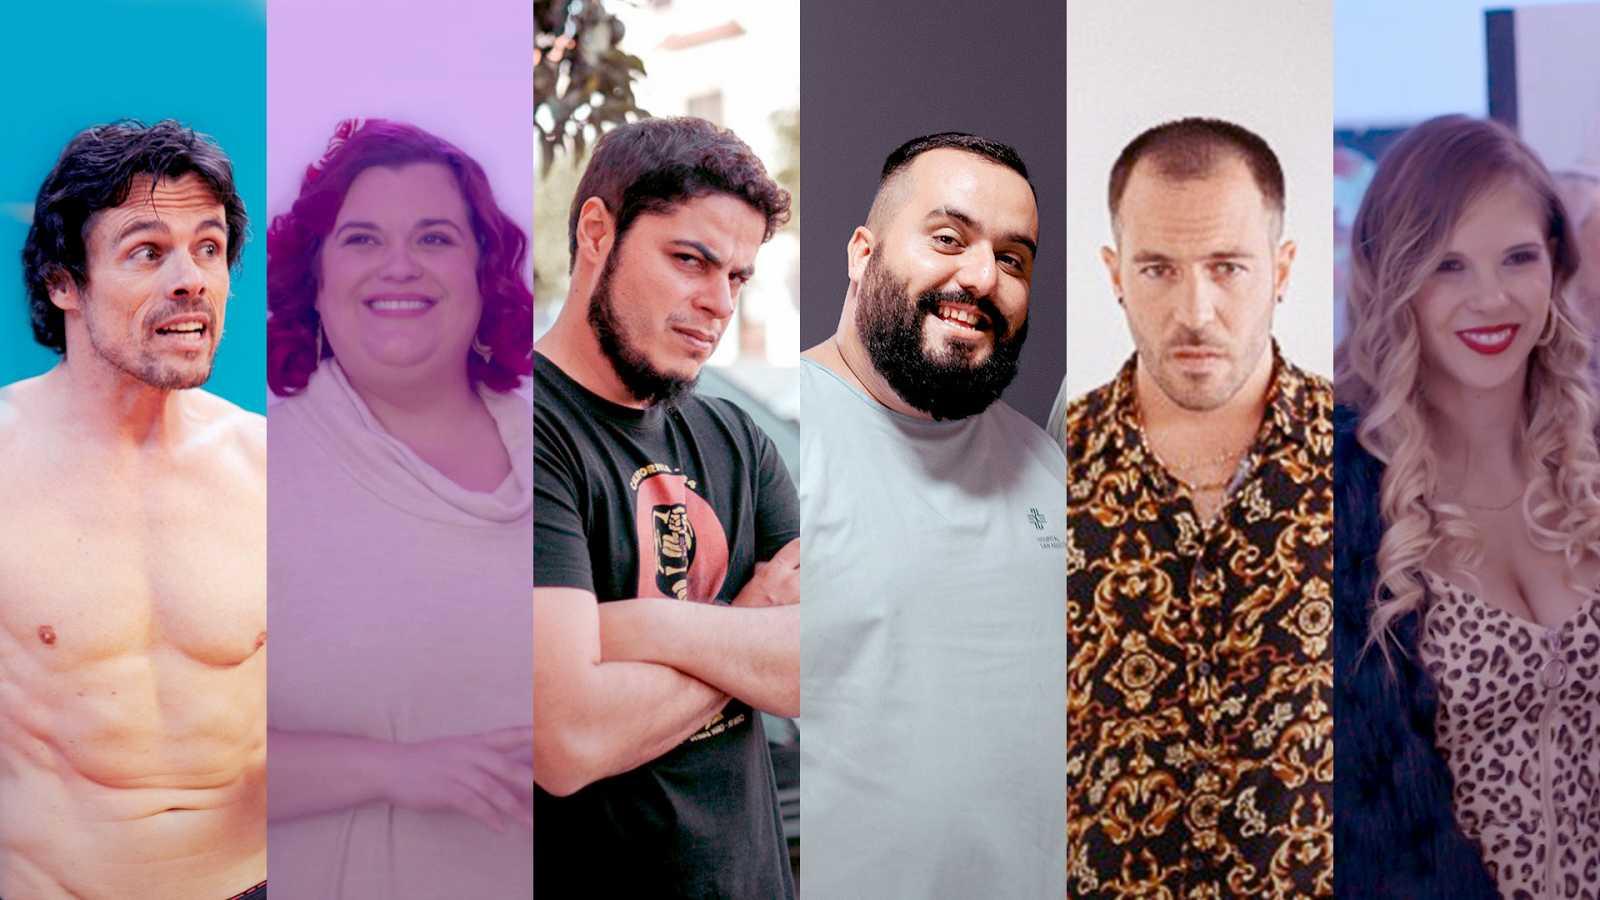 De izq. a dcha. Octavi Pujades, Lola Hernández, David Sainz, Kike Pérez,Diego Villalba yPatricia Toro, parte del elenco de 'Grasa'